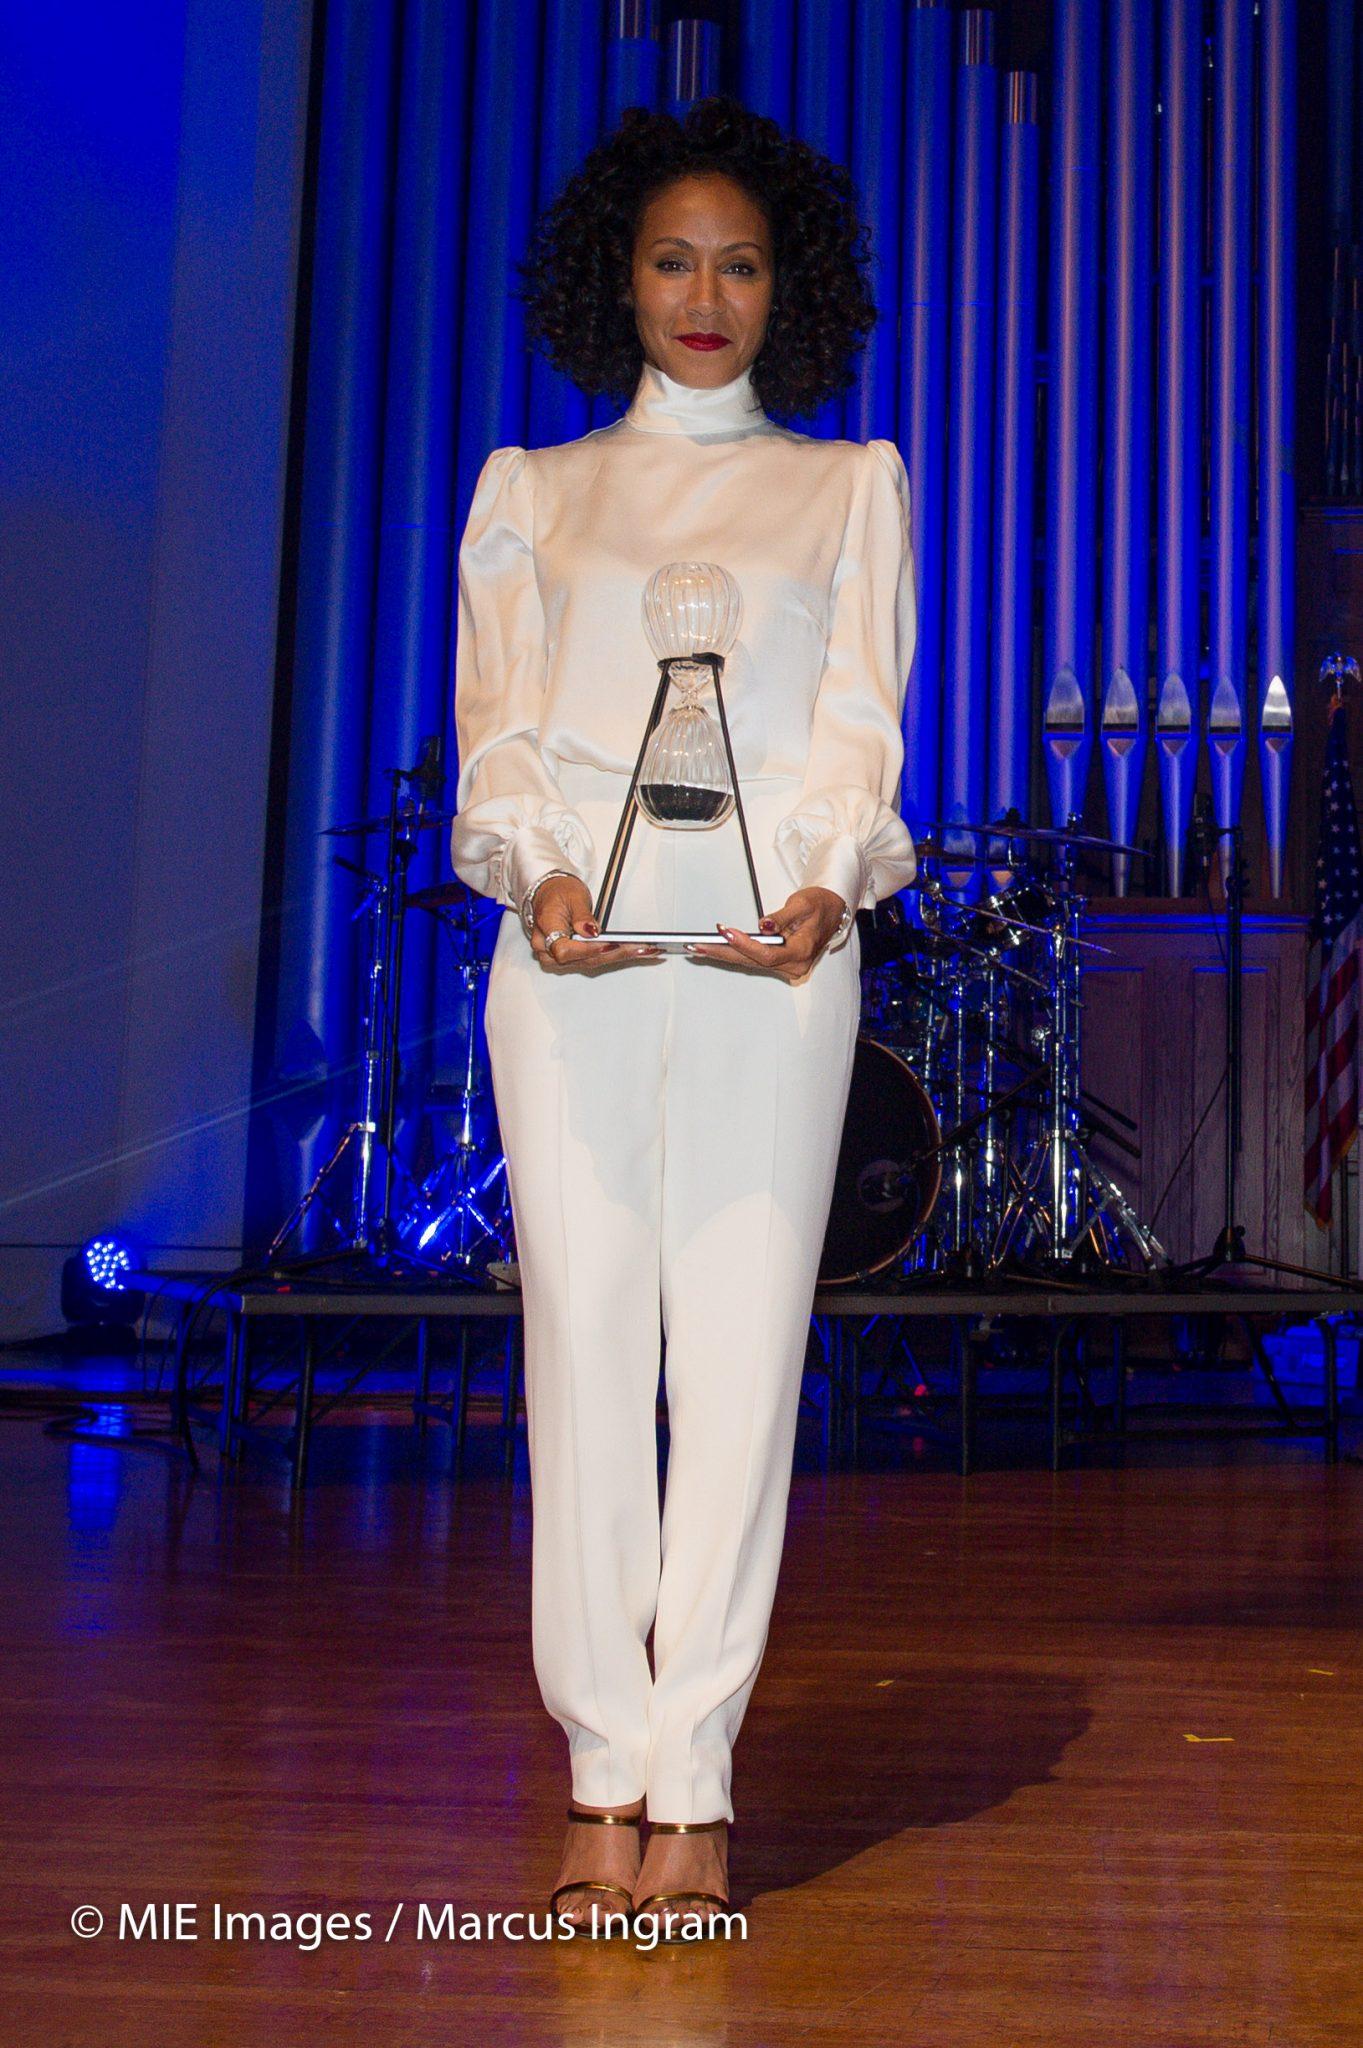 Jada Pinkett Smith & More Honored At 2017 HBCU Power Awards